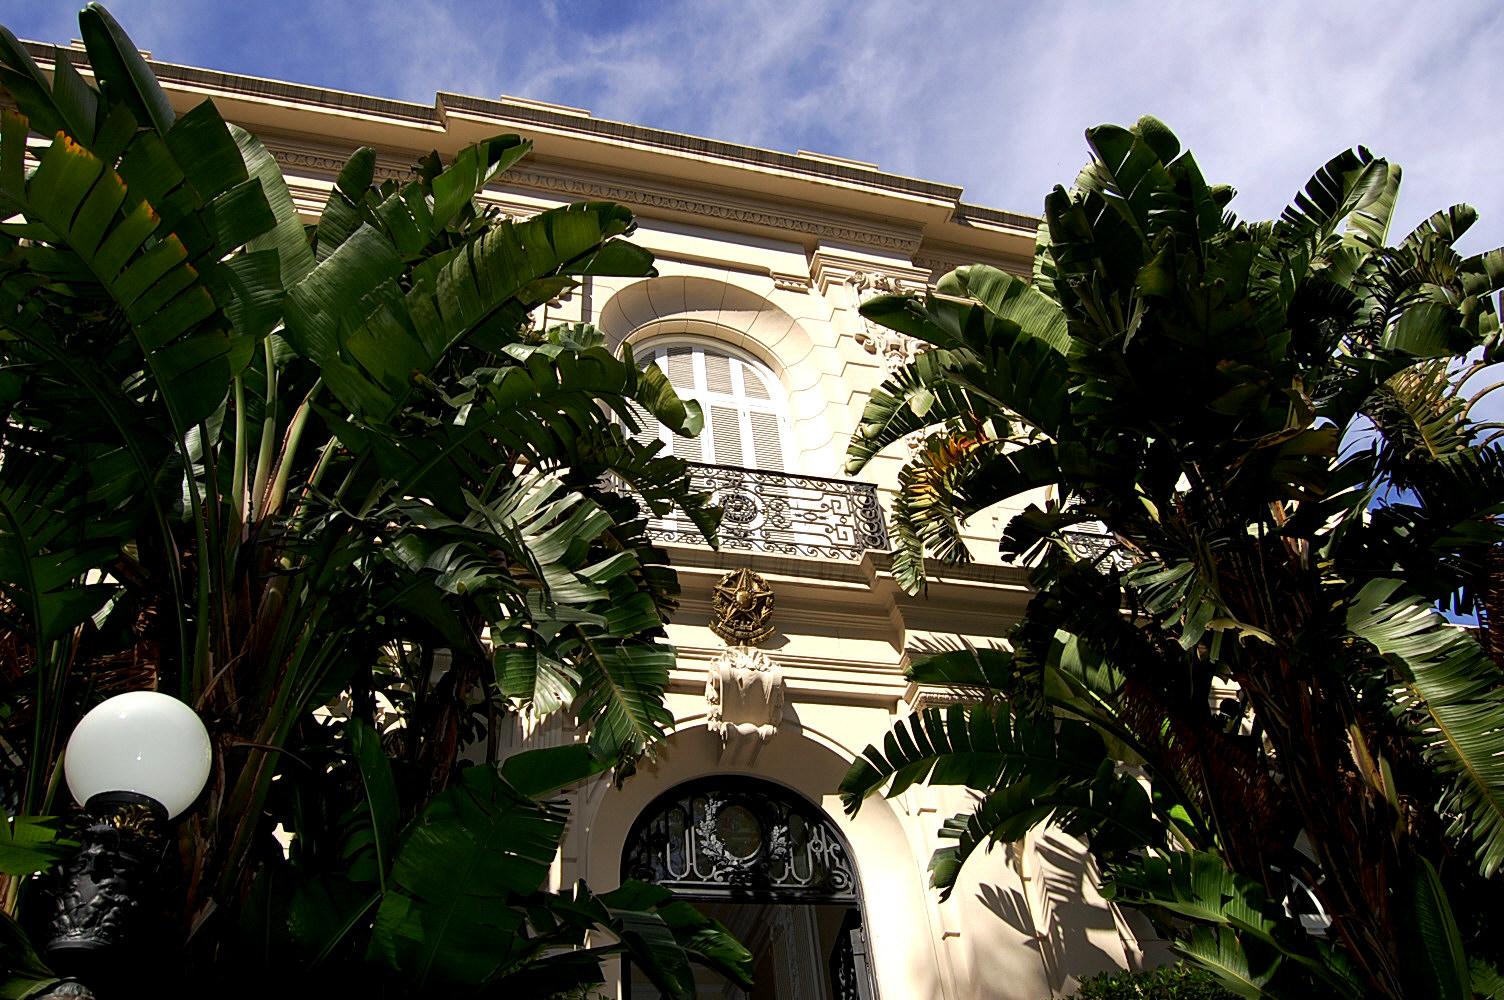 File:EMBAJADA DE BRASIL JPG - Wikimedia Commons